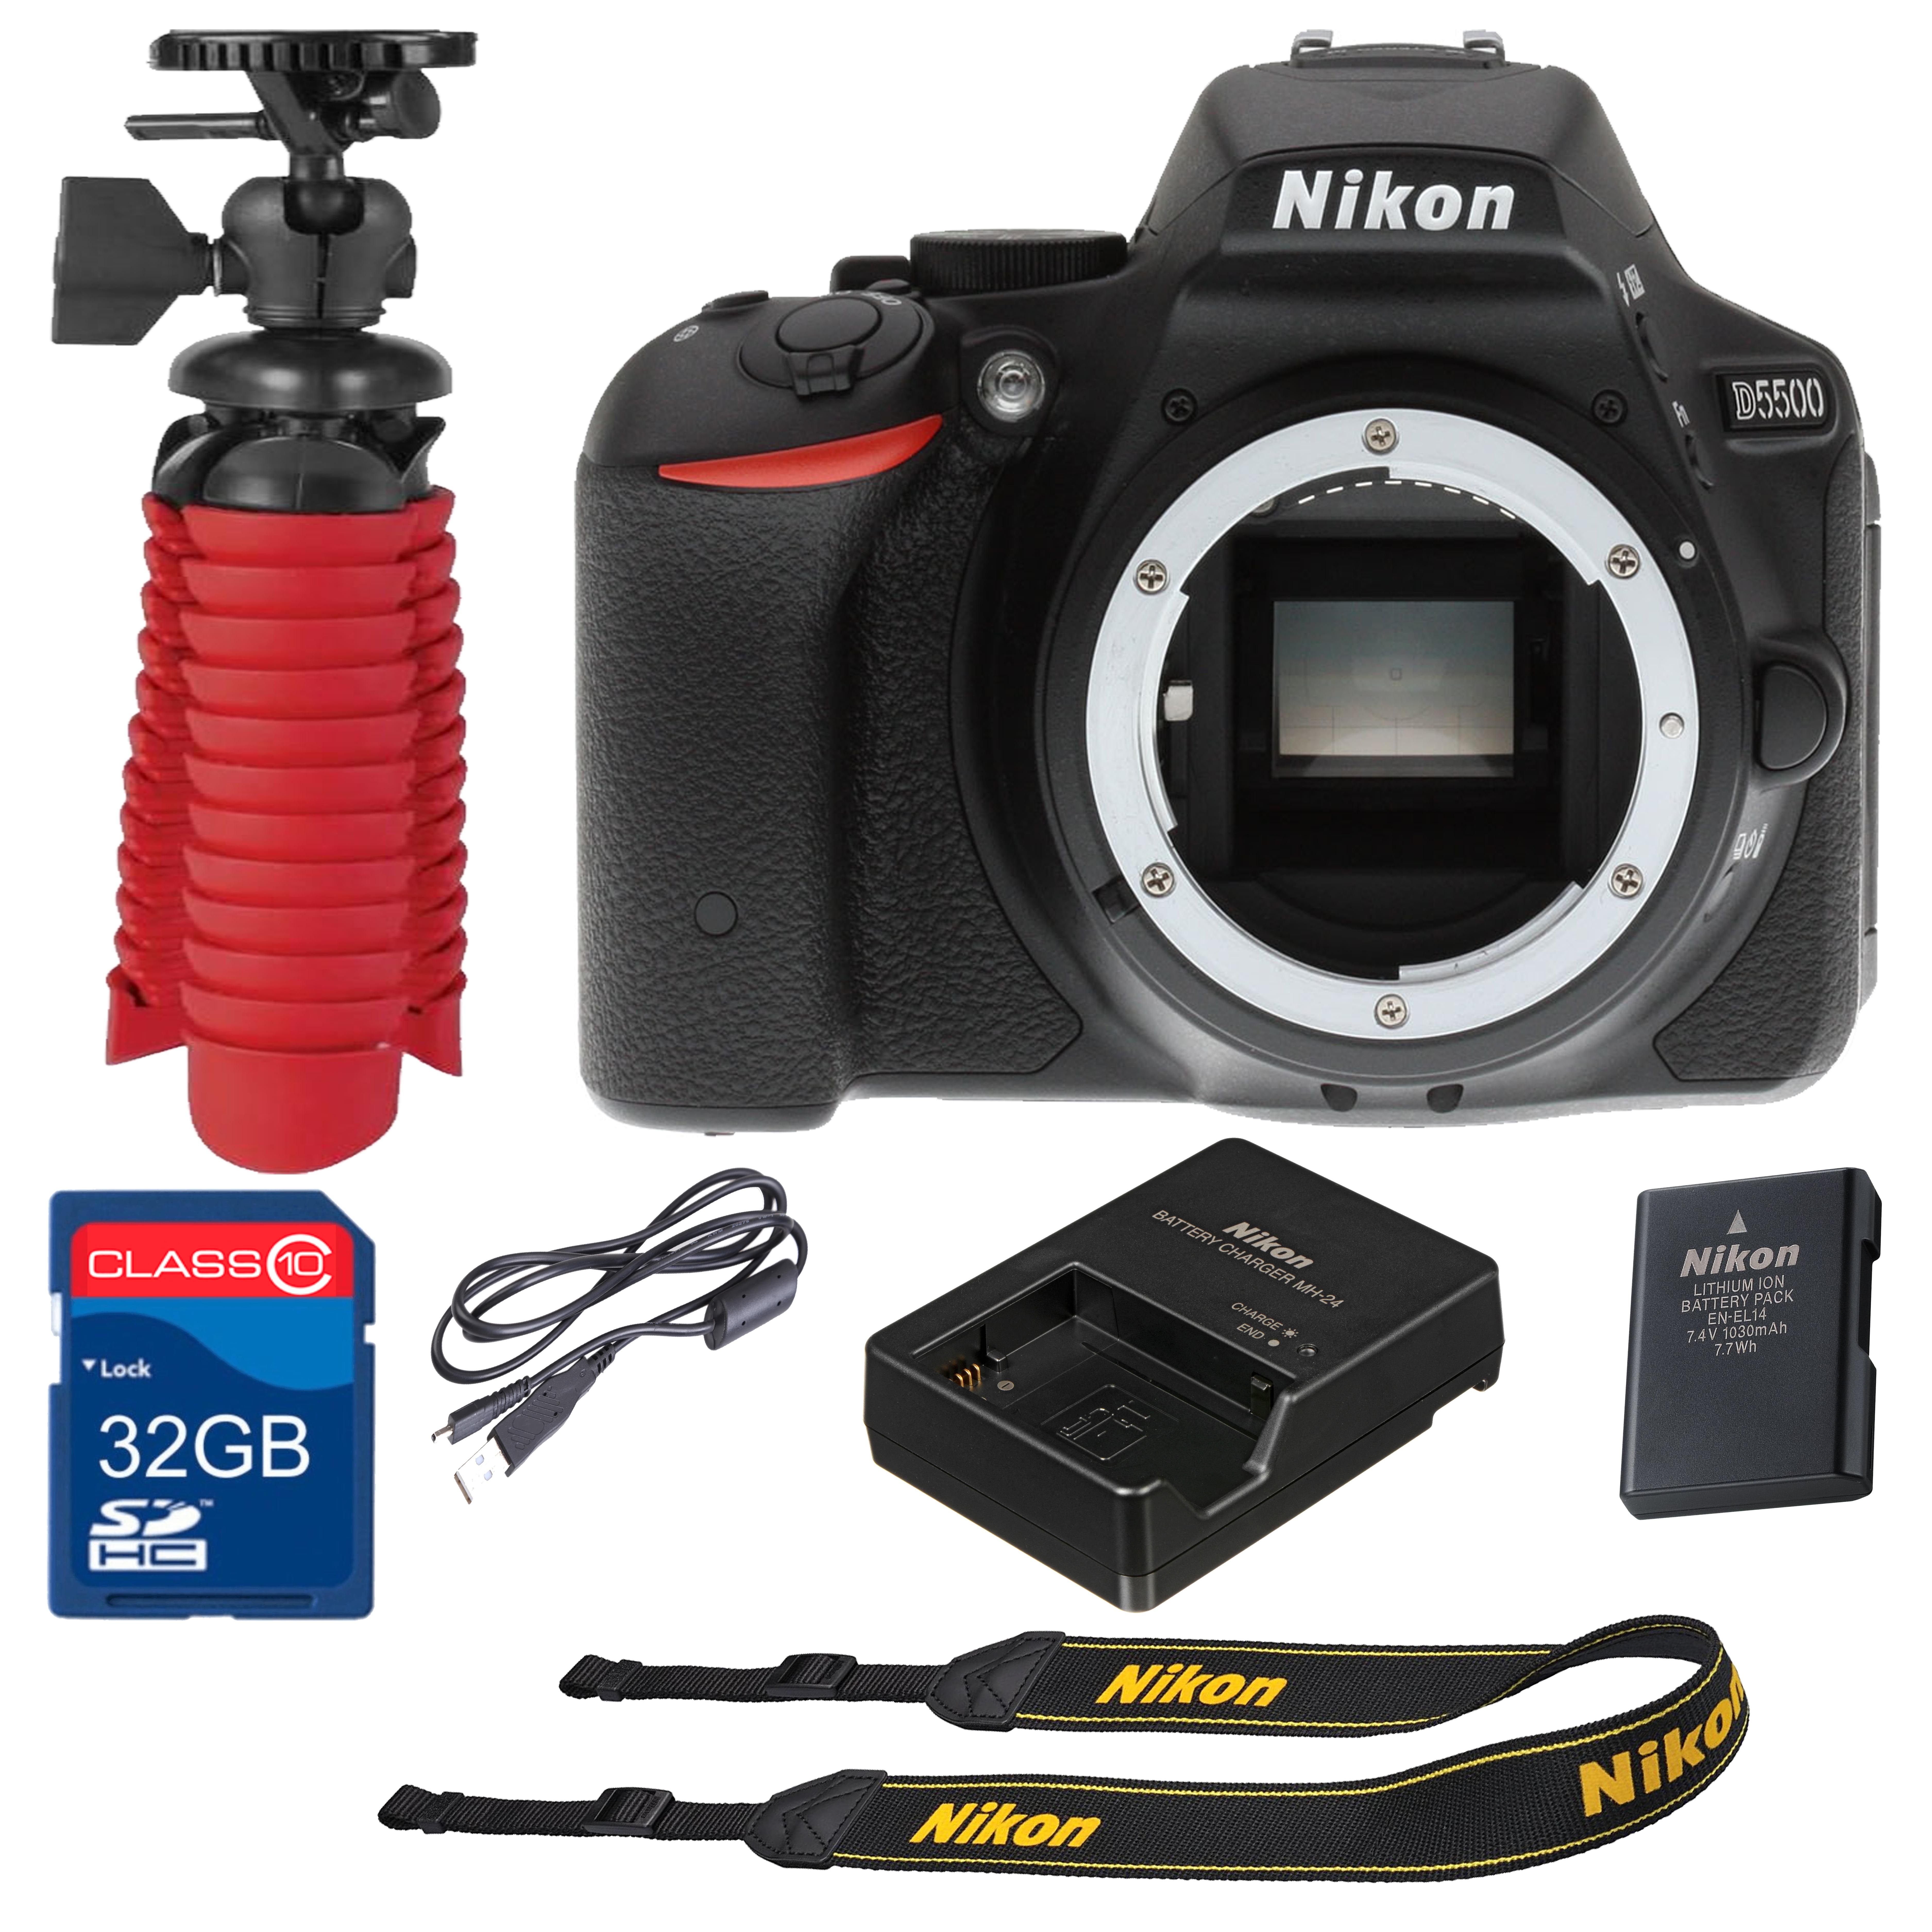 Nikon D5500 Digital SLR Camera  24.2 Megapixels  Body Only